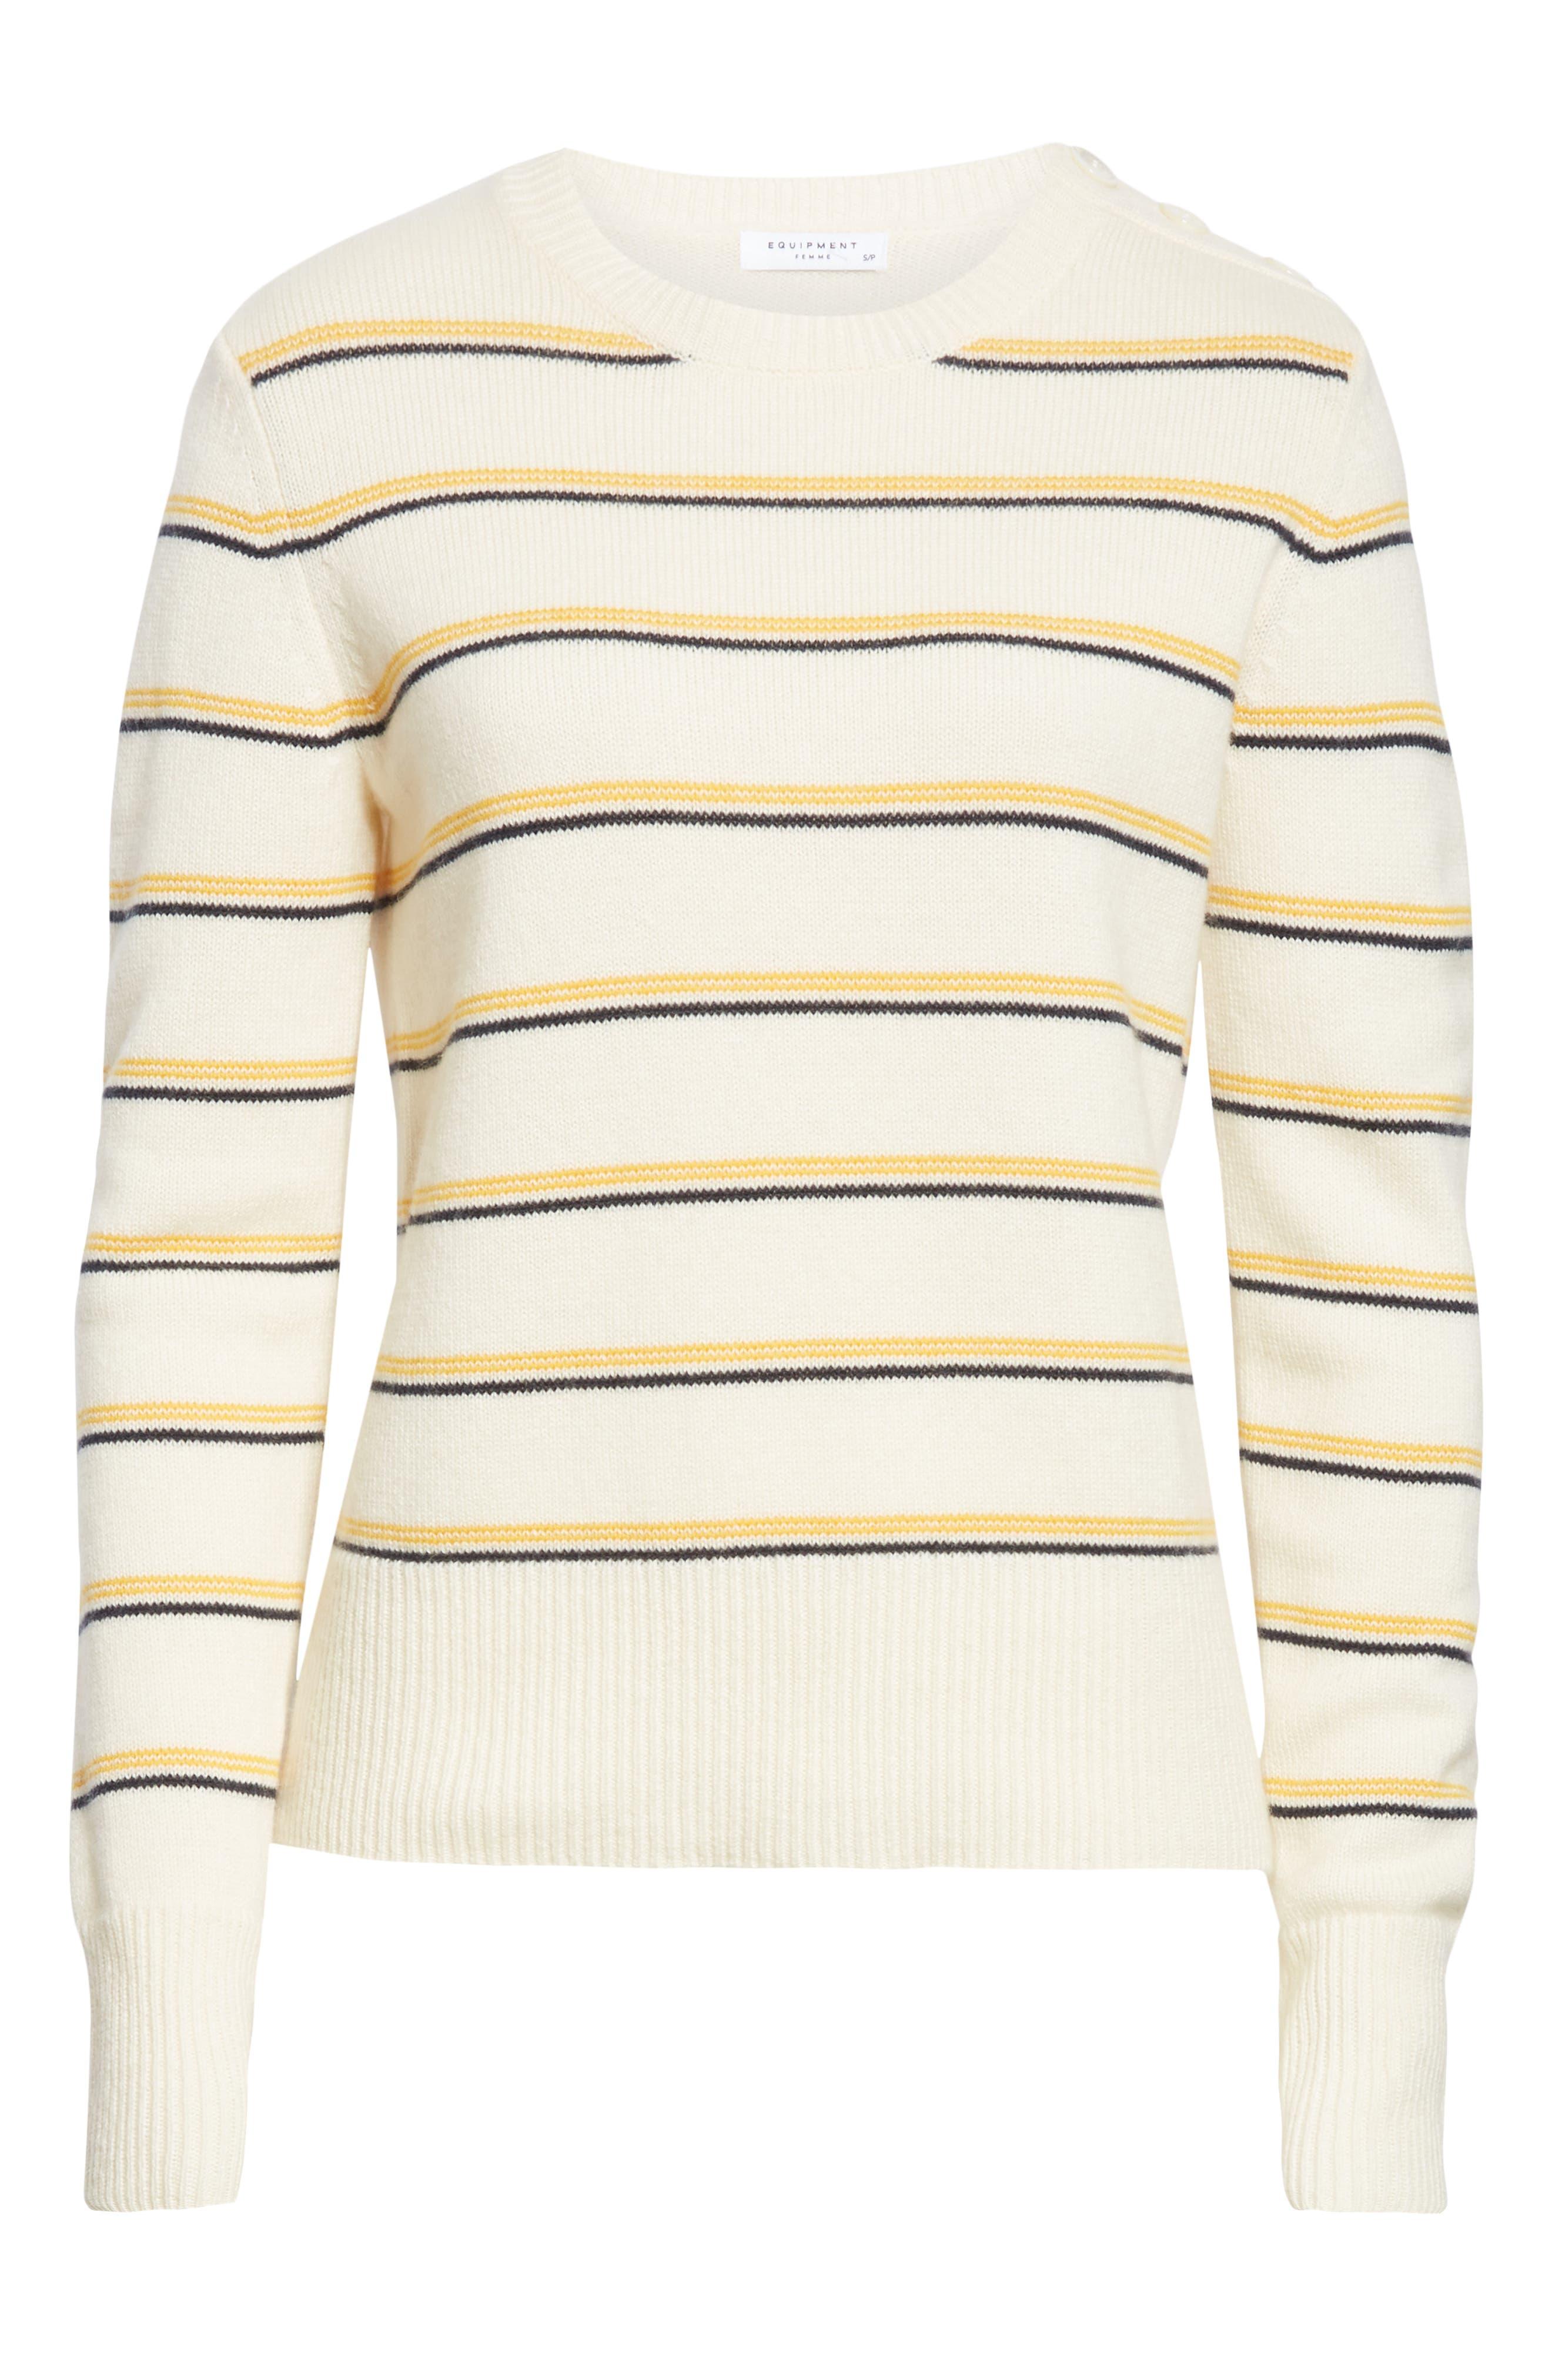 EQUIPMENT, Duru Wool & Cashmere Sweater, Alternate thumbnail 6, color, 110